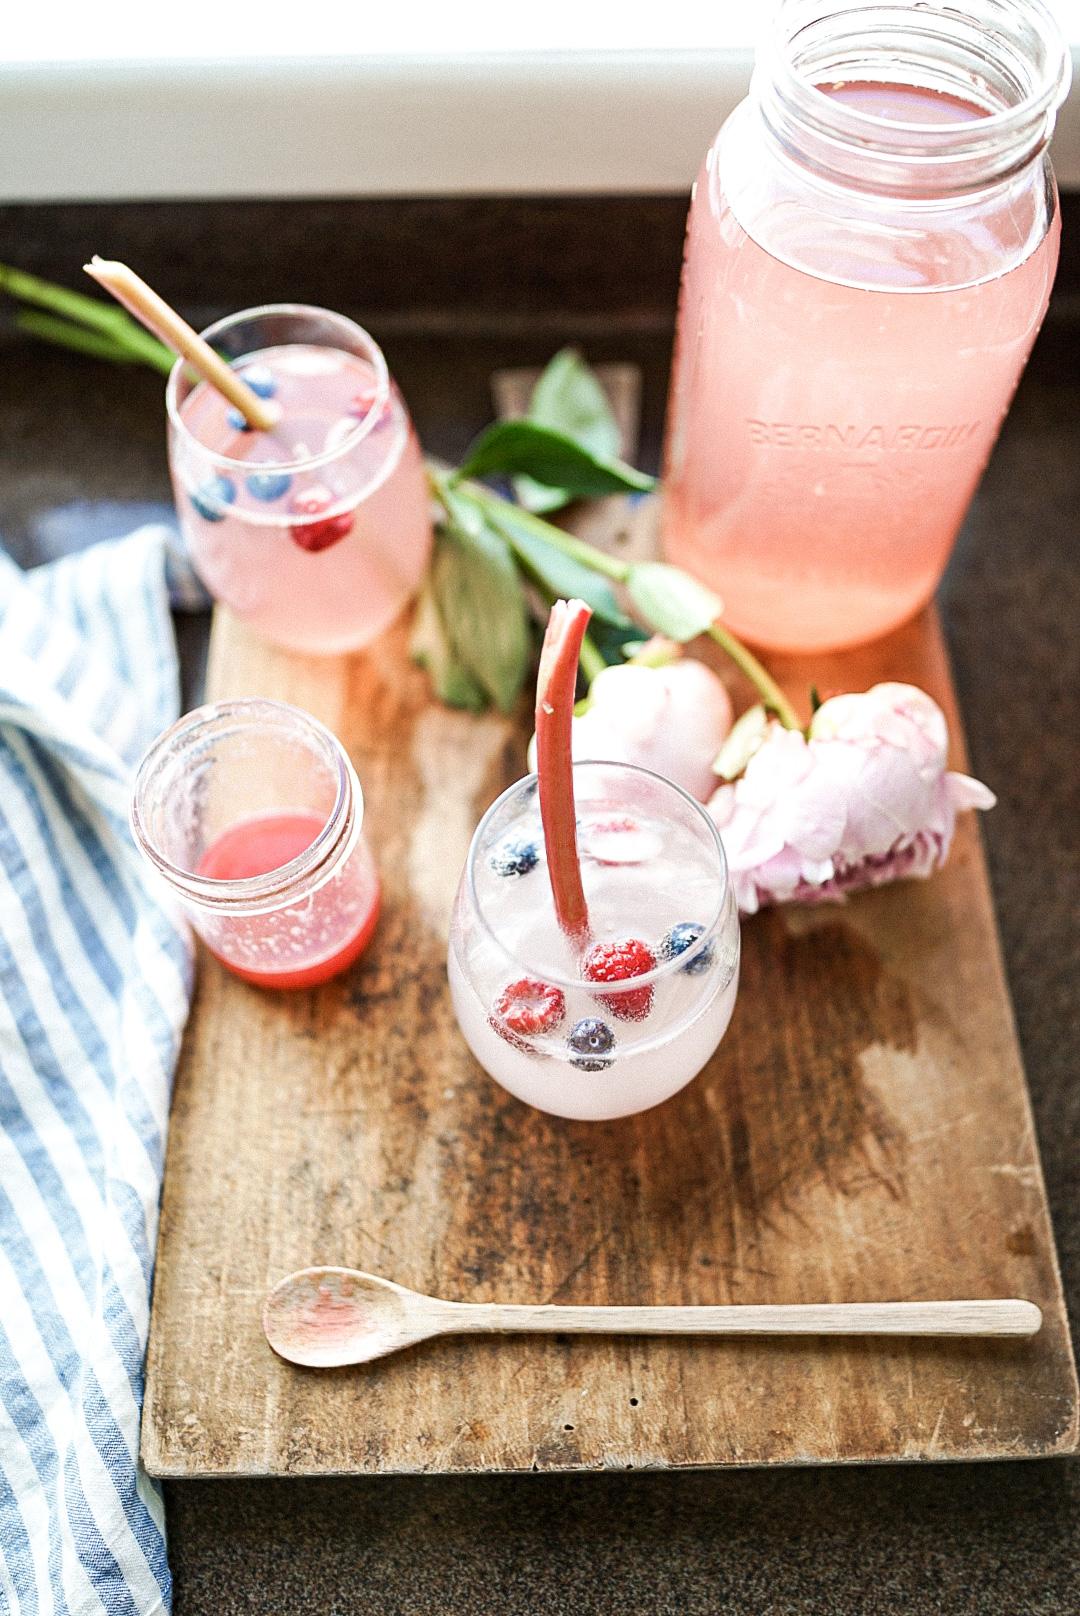 rhubarb 2 ways rhubarb syrup and juice